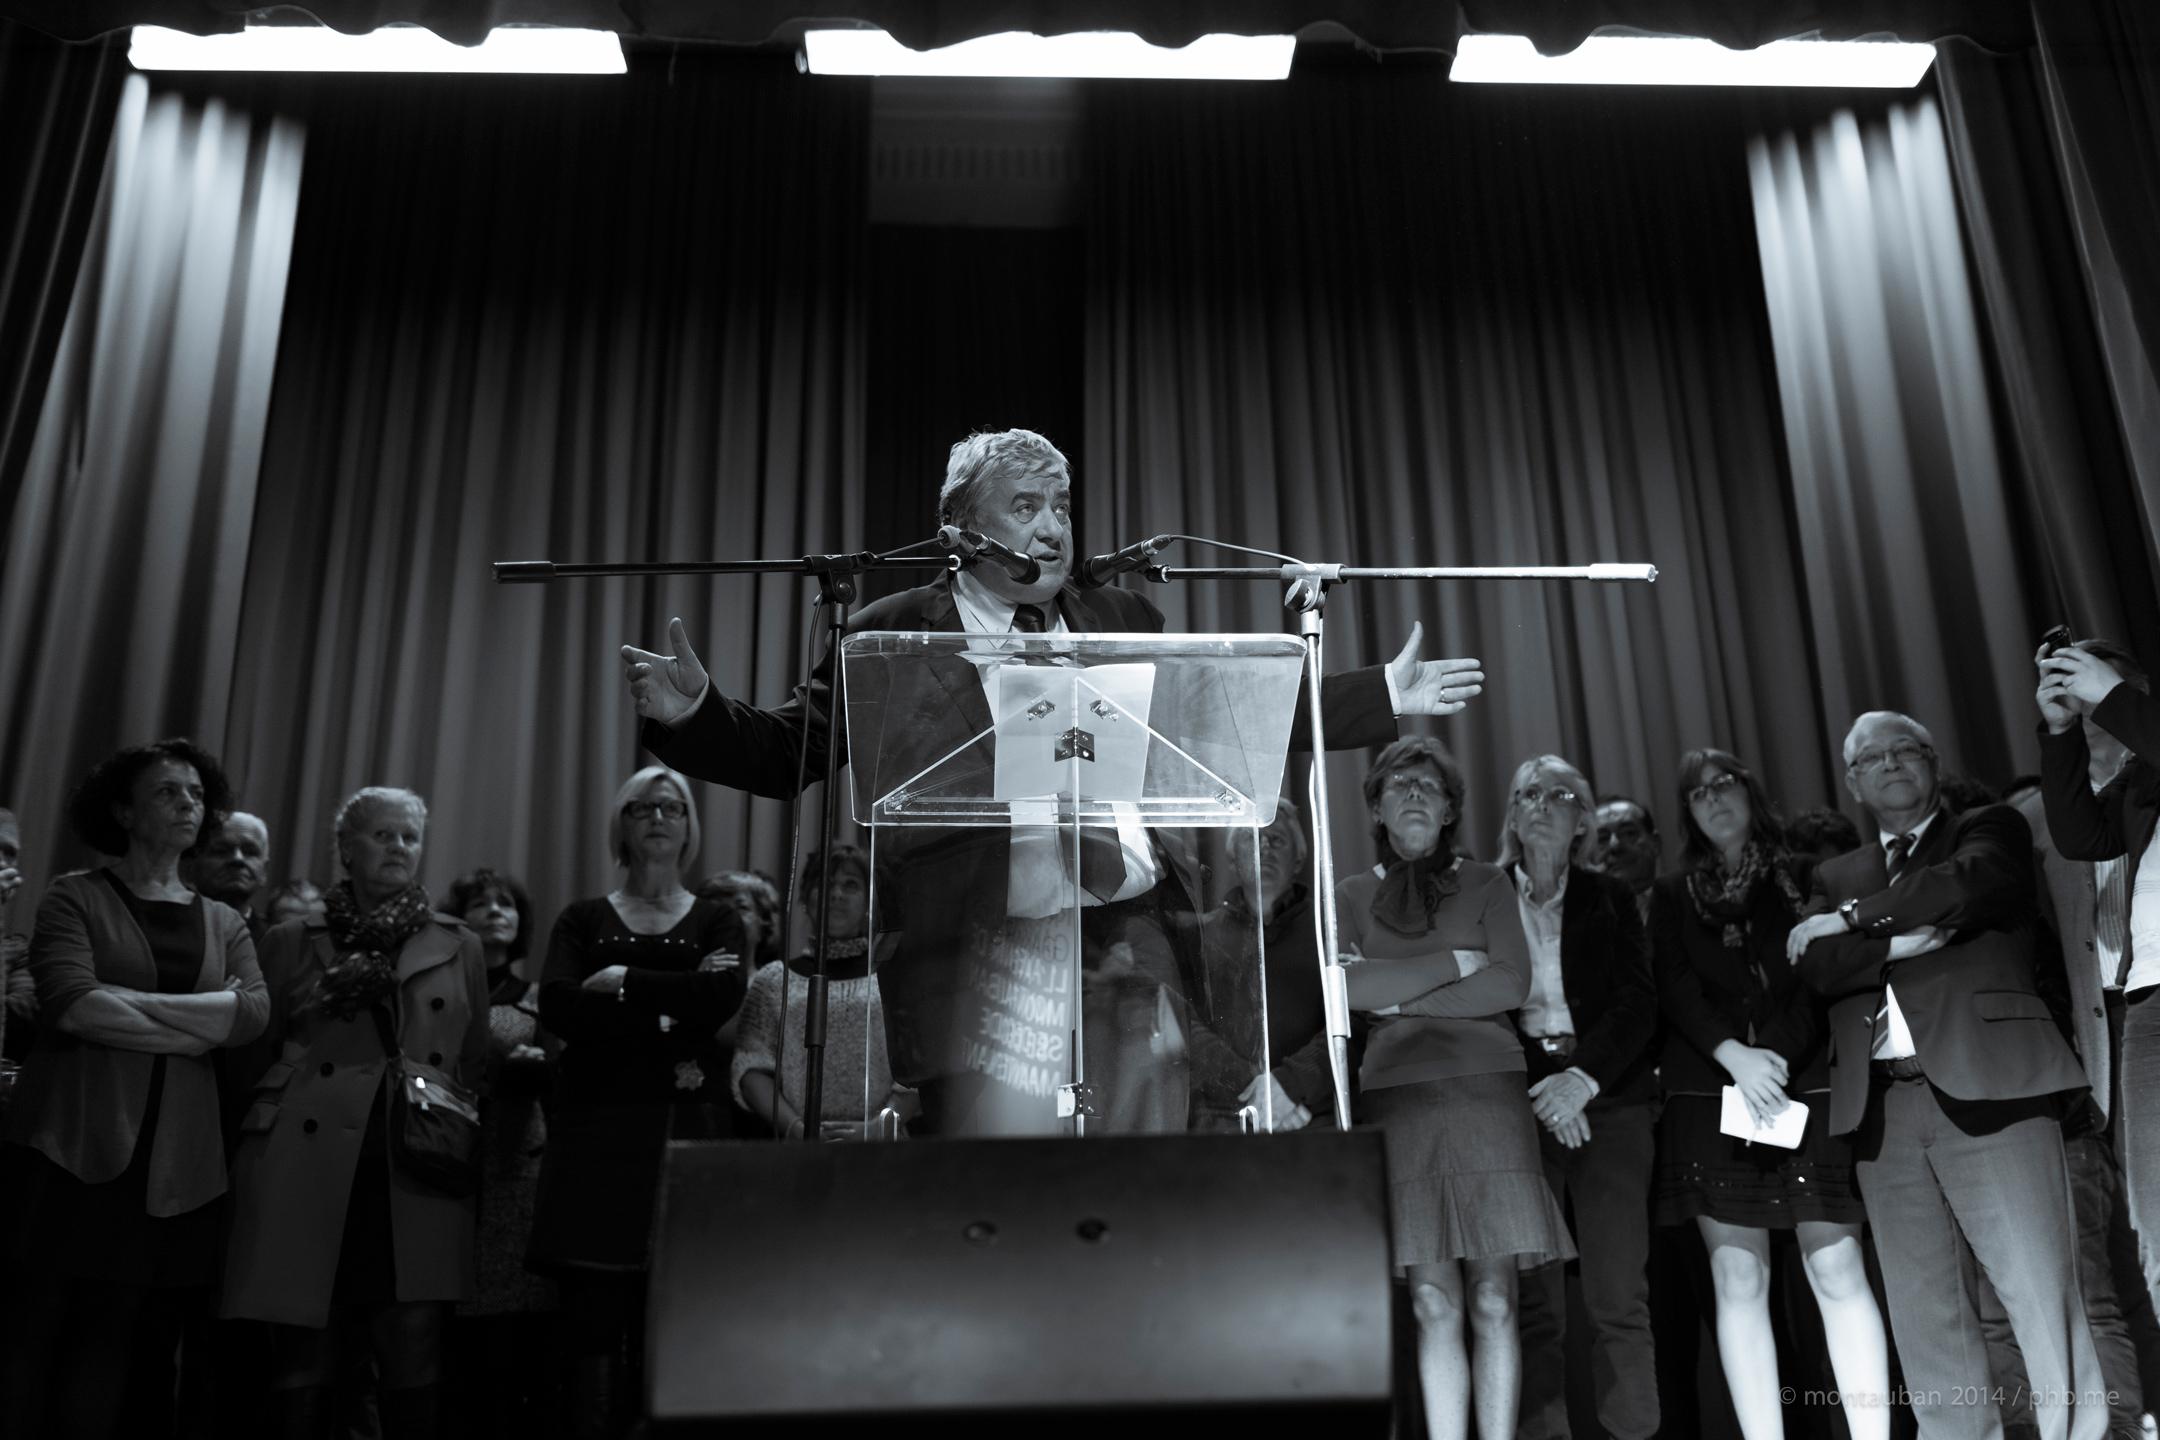 Montauban-2014-Rassemblement-peuple-gauche-vote-IMG_3352-2